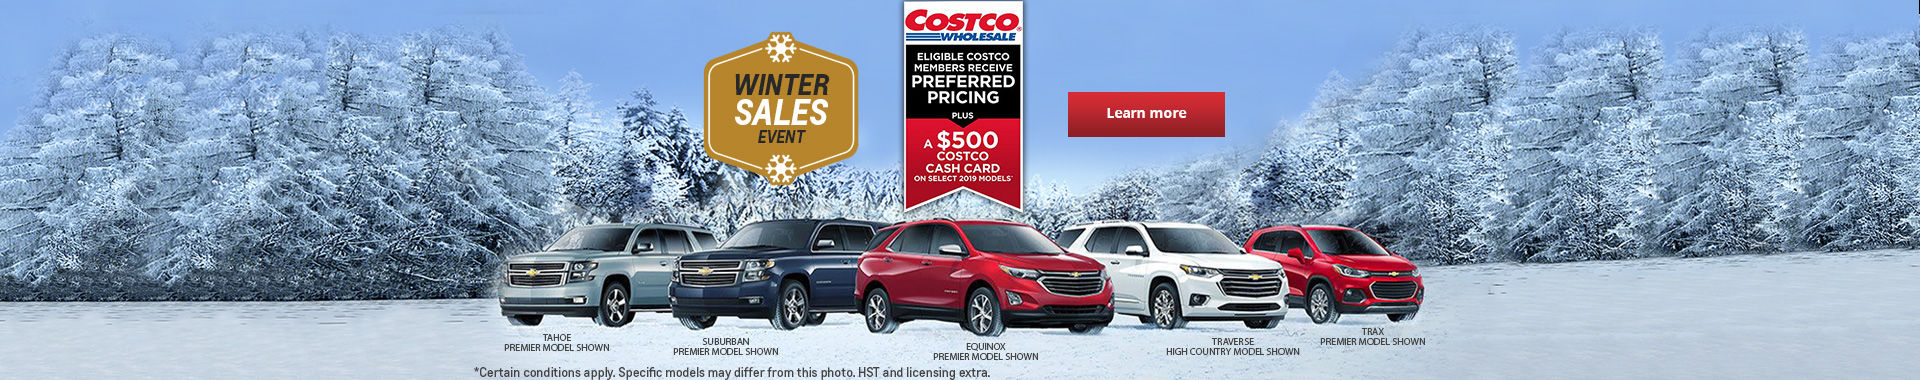 Chevrolet Costco Event - Header